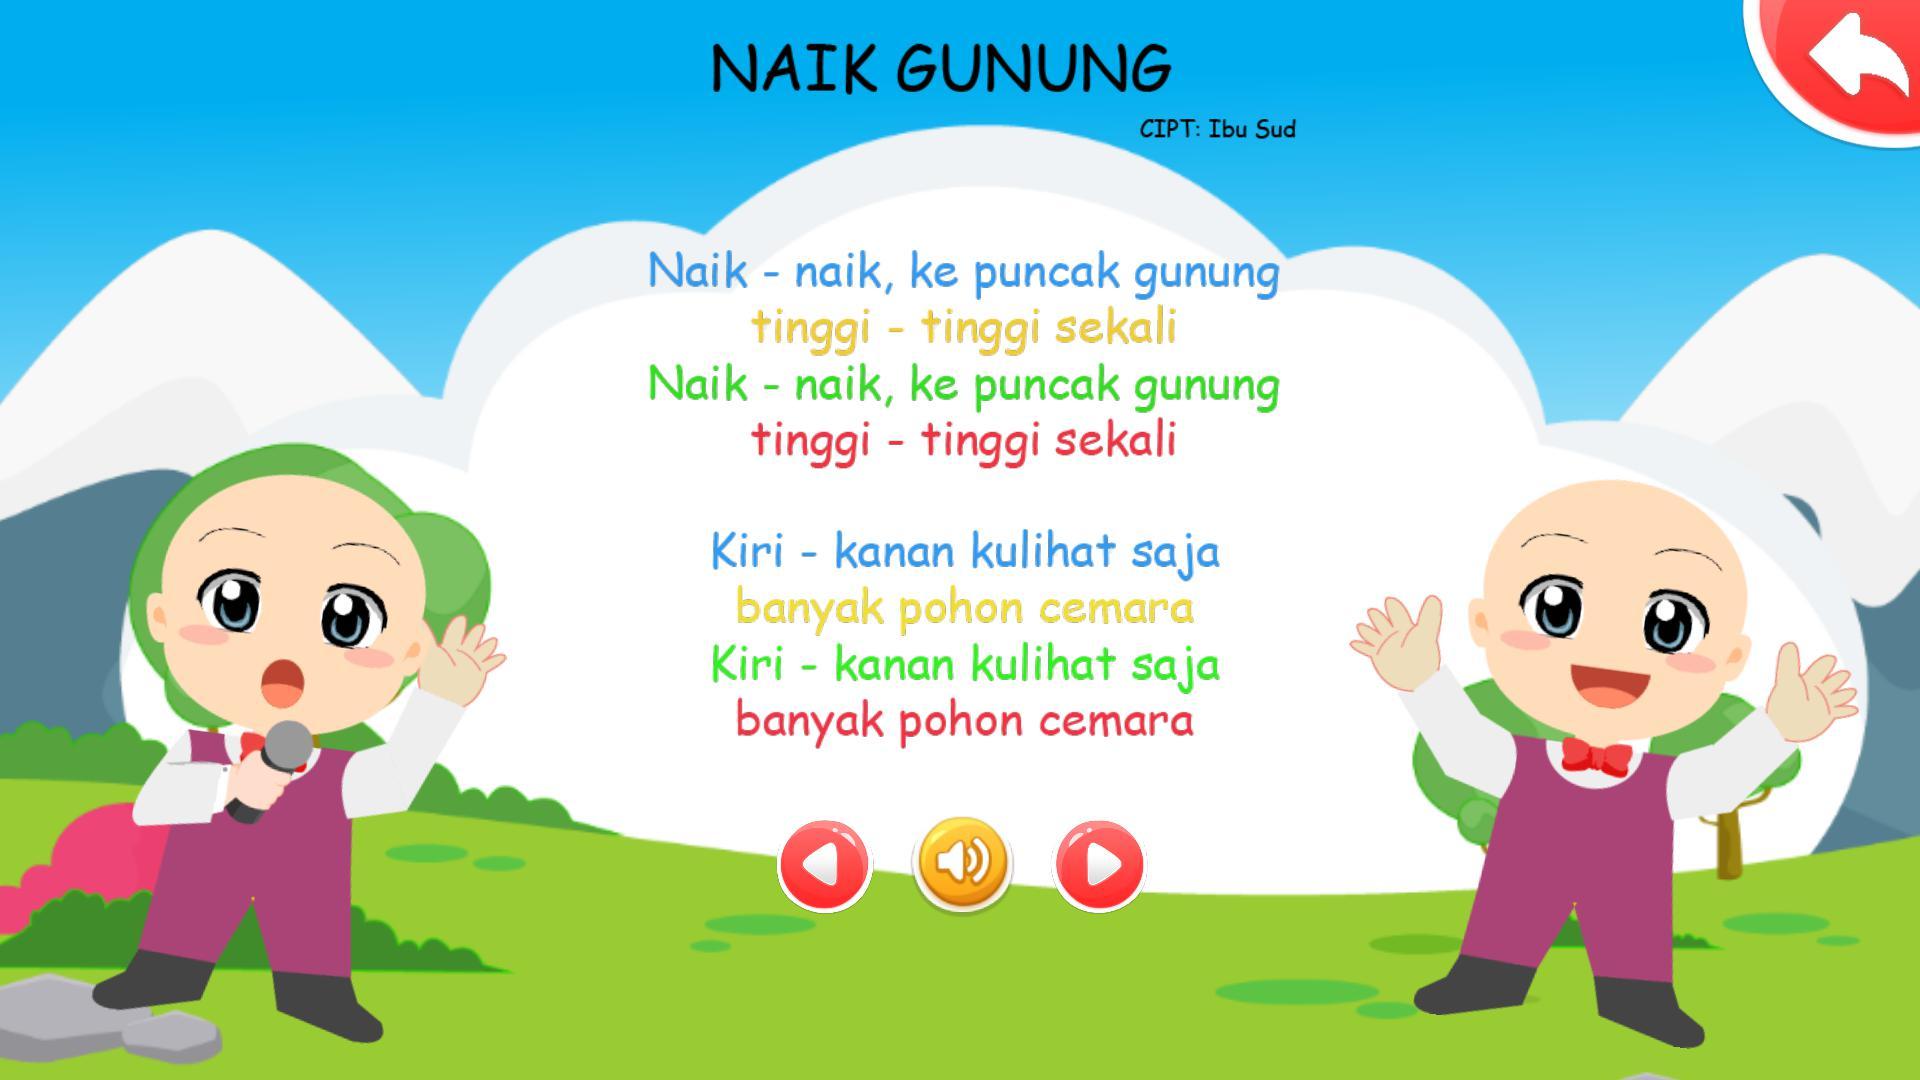 Menyanyi Lagu Anak Bersama 2 游戏截图2